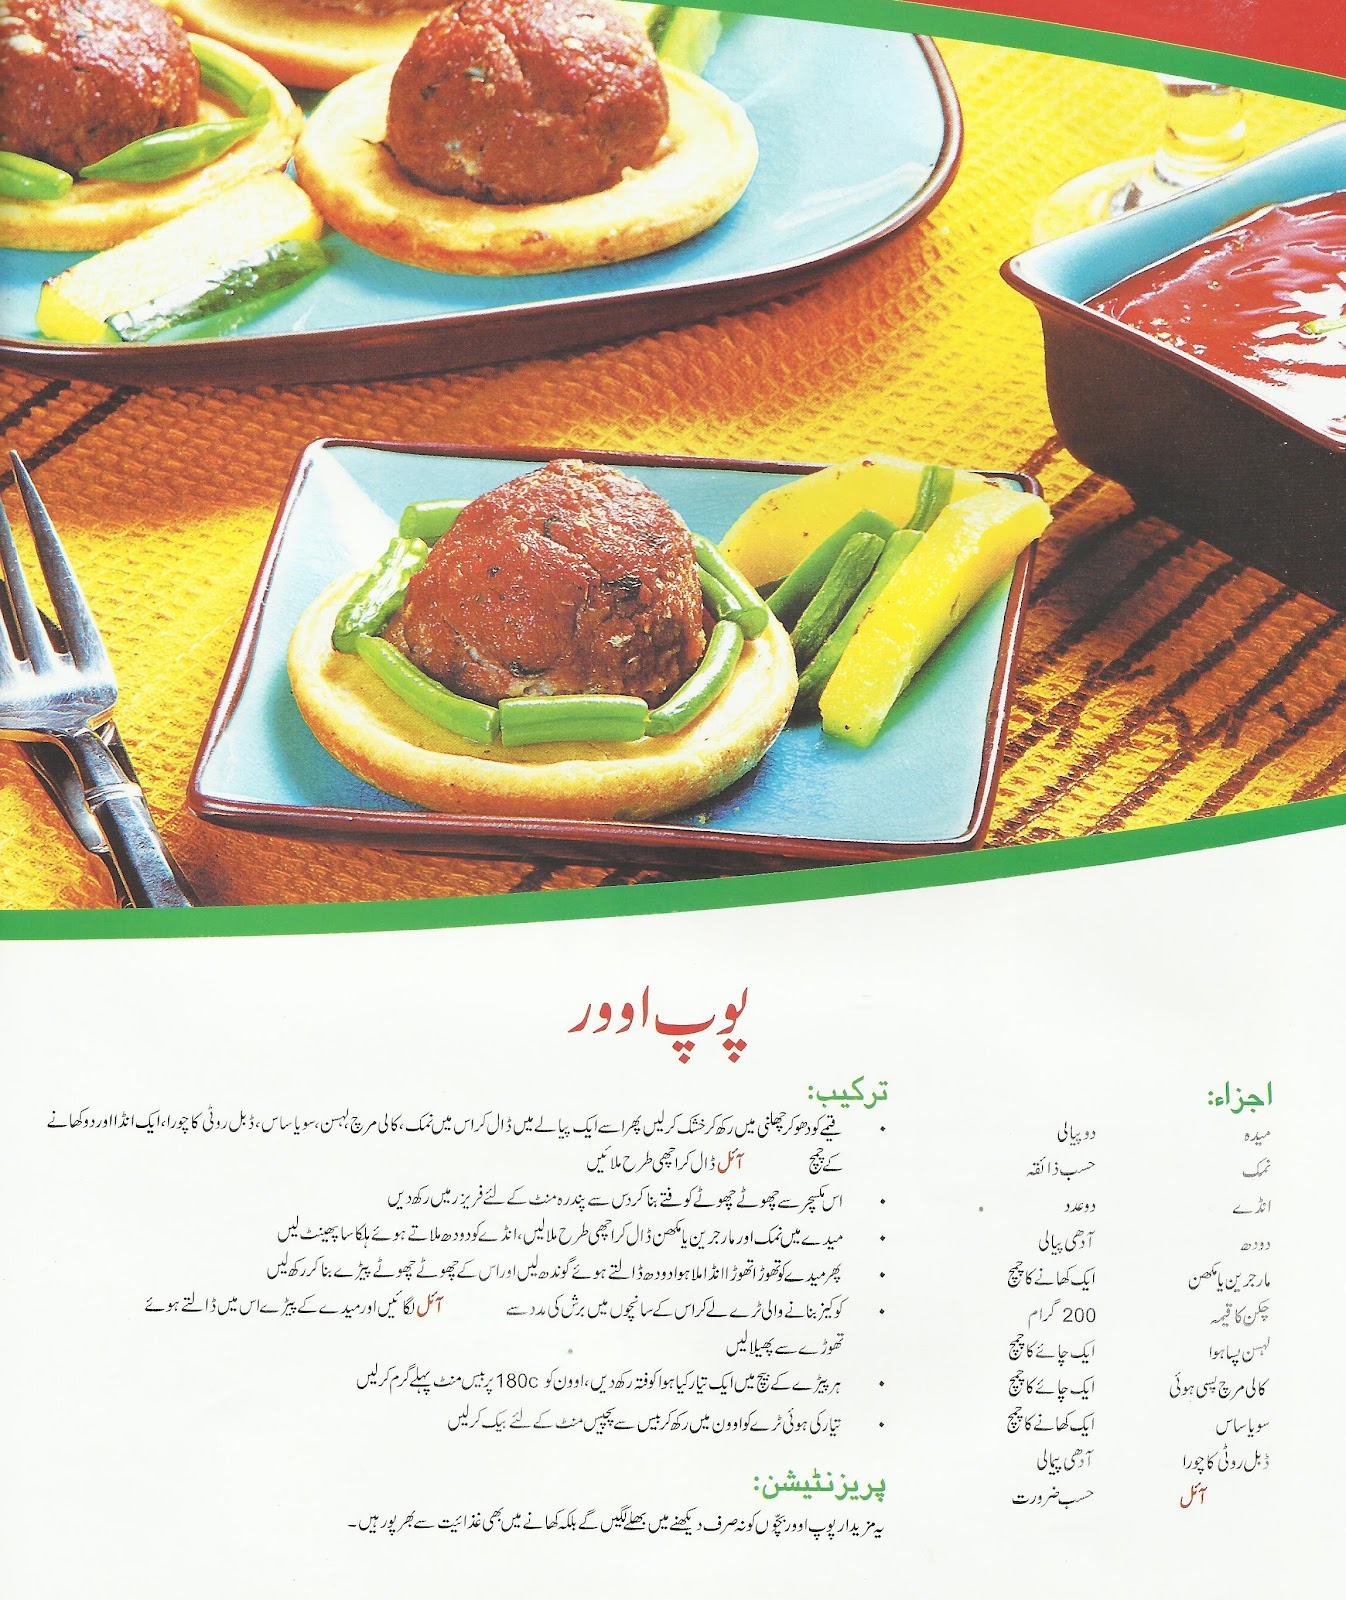 Recipes For Kids In Urdu For Desserts For Dinner For